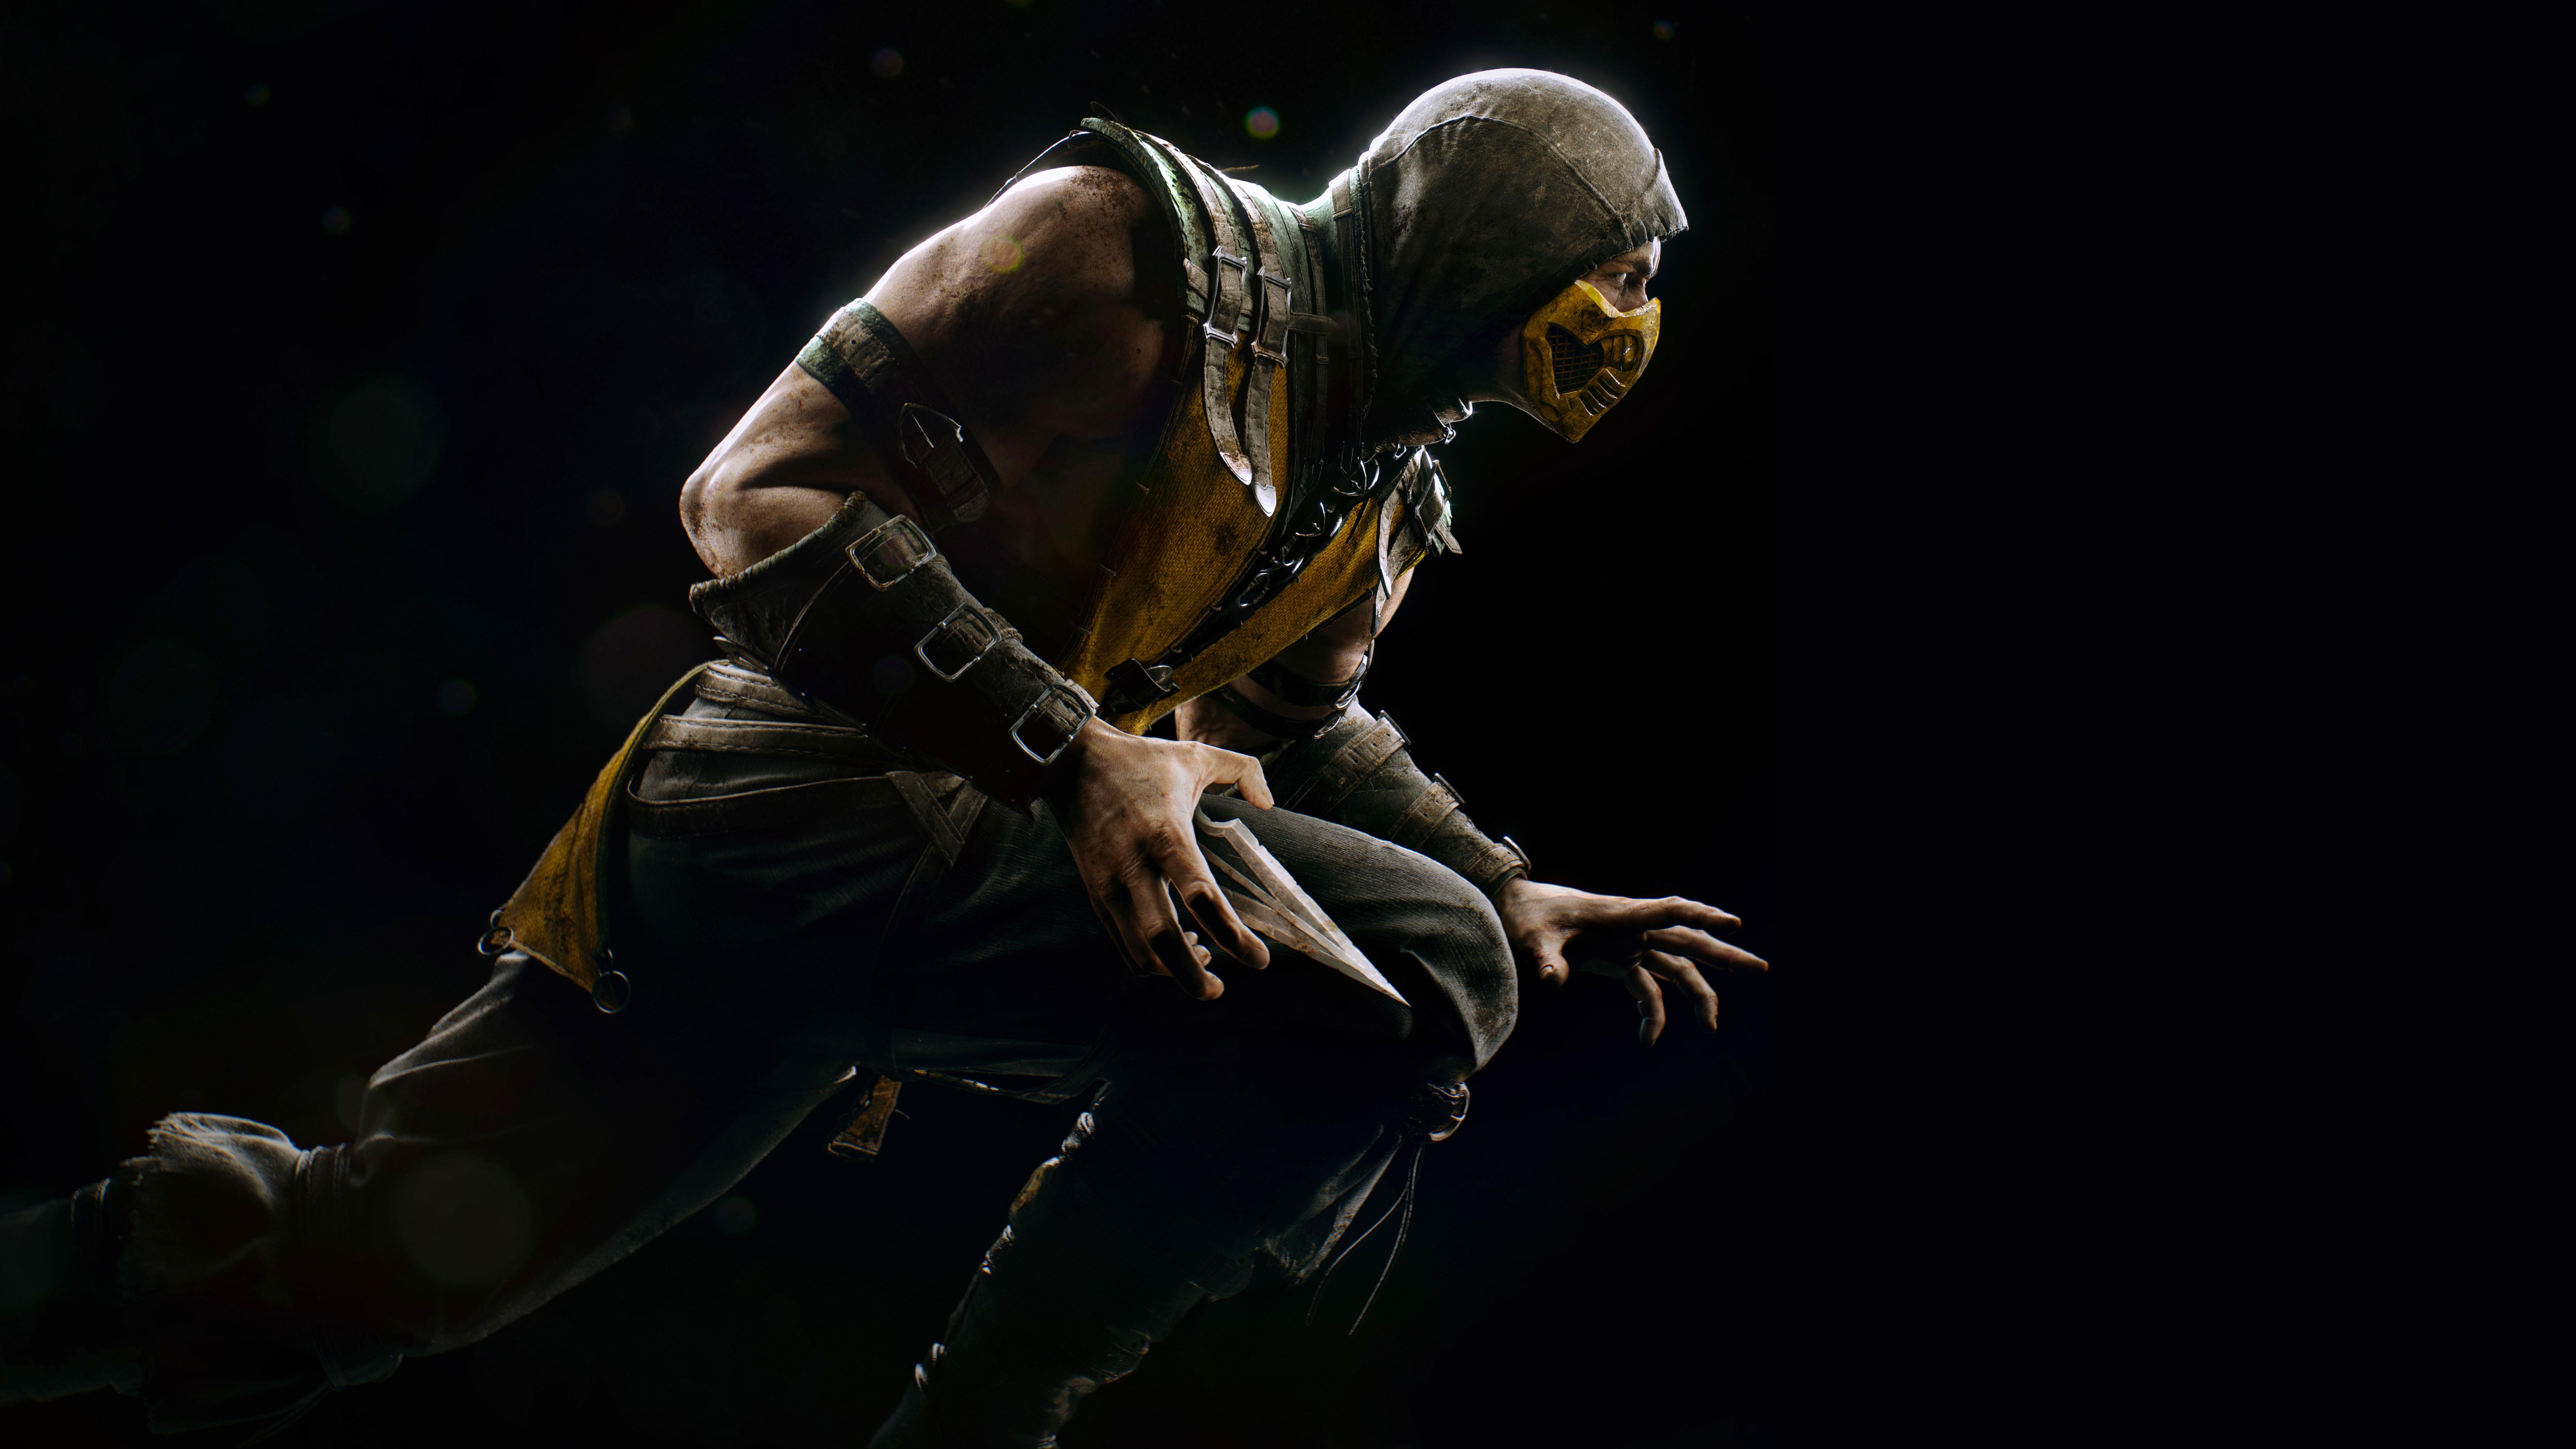 Scorpion Mortal Kombat X Game PS4 PC 8K Wallpaper - Best ...